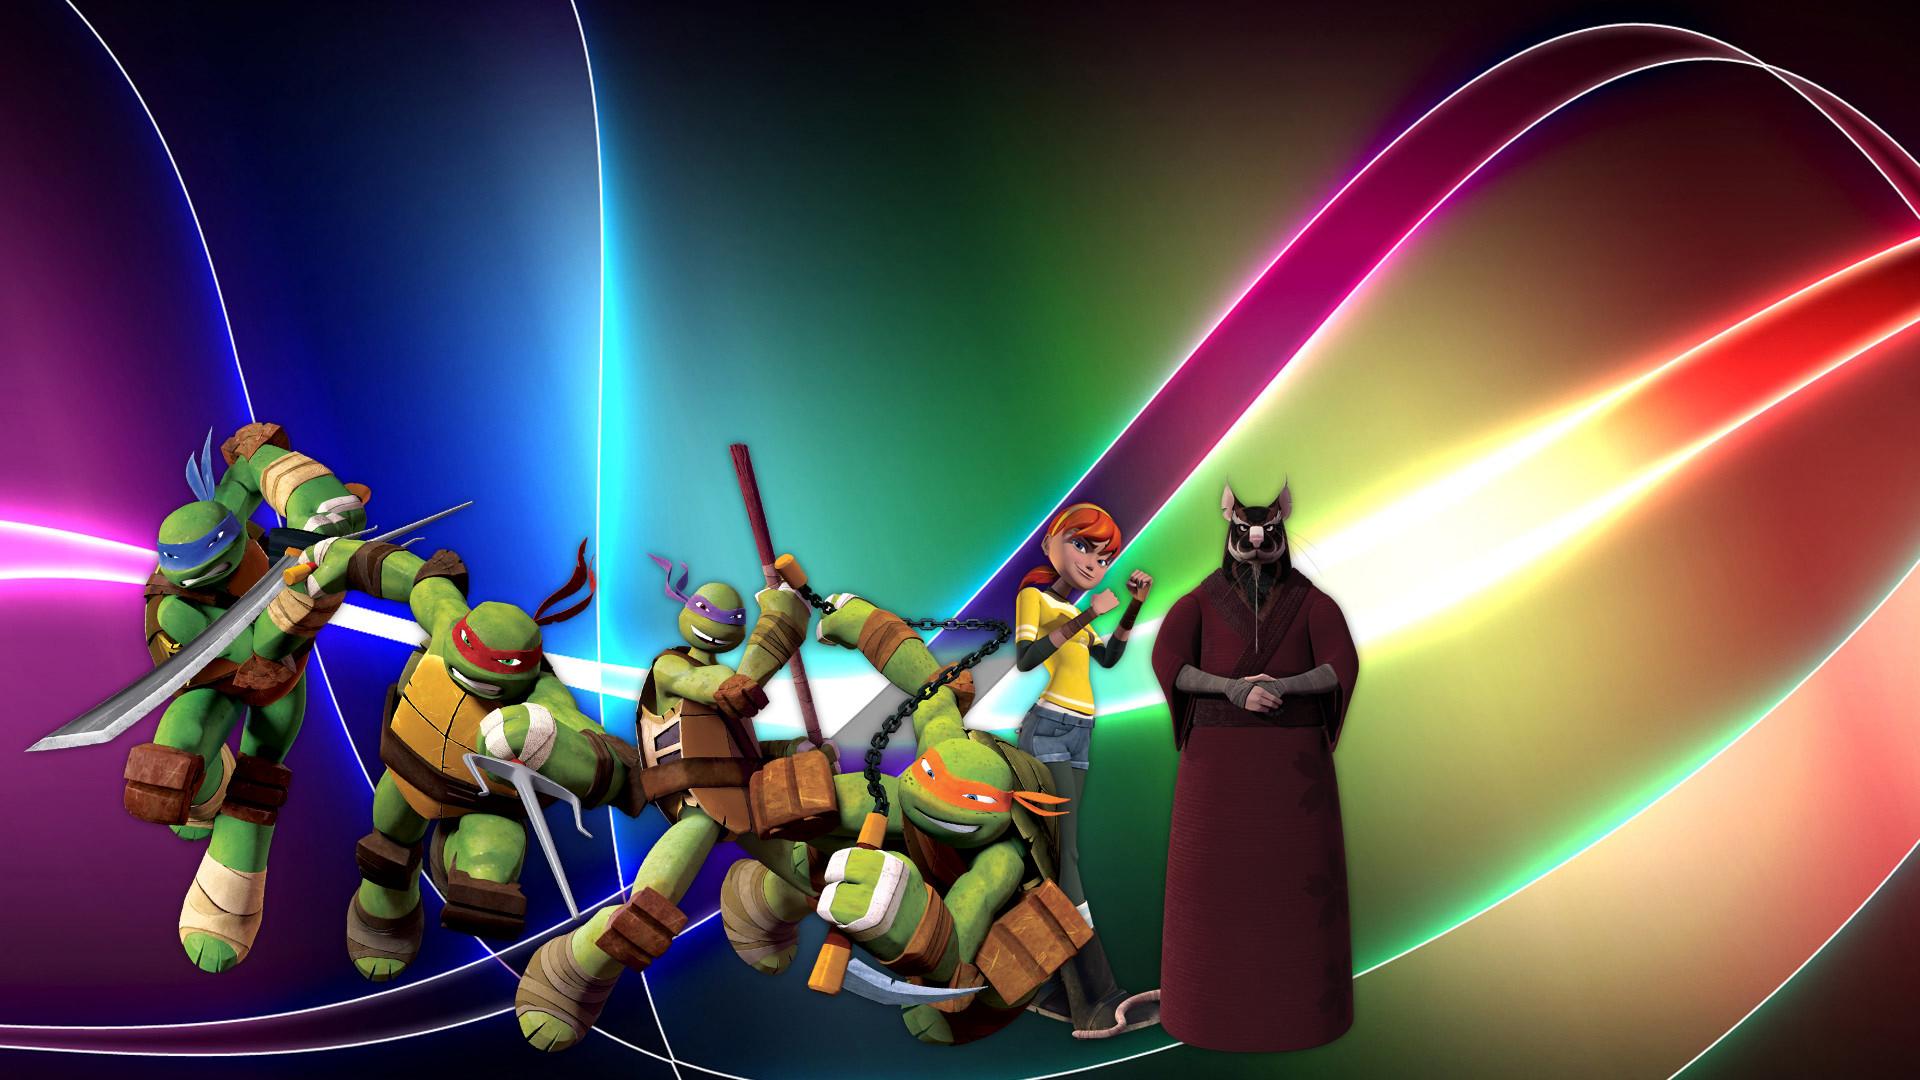 Raphael Teenage Mutant Ninja Turtles HD desktop wallpaper High